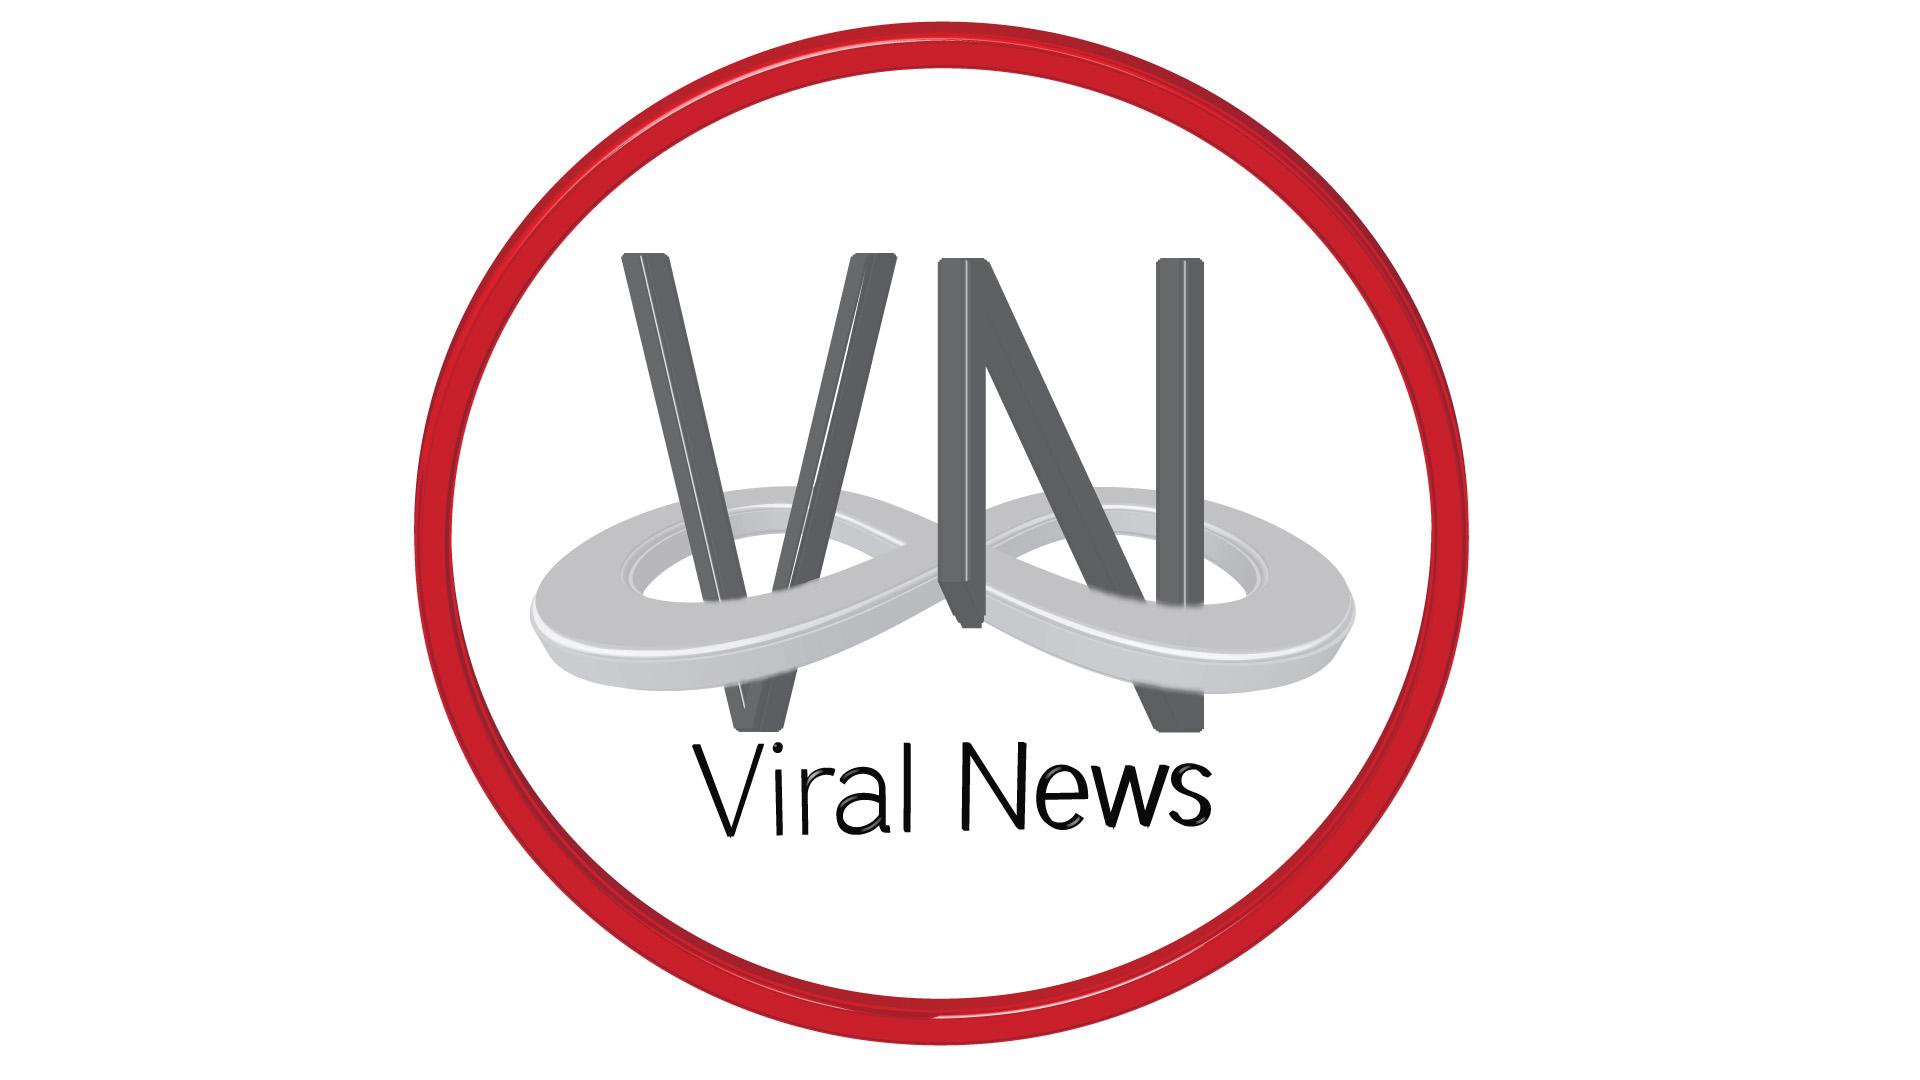 ViralNews.jpg